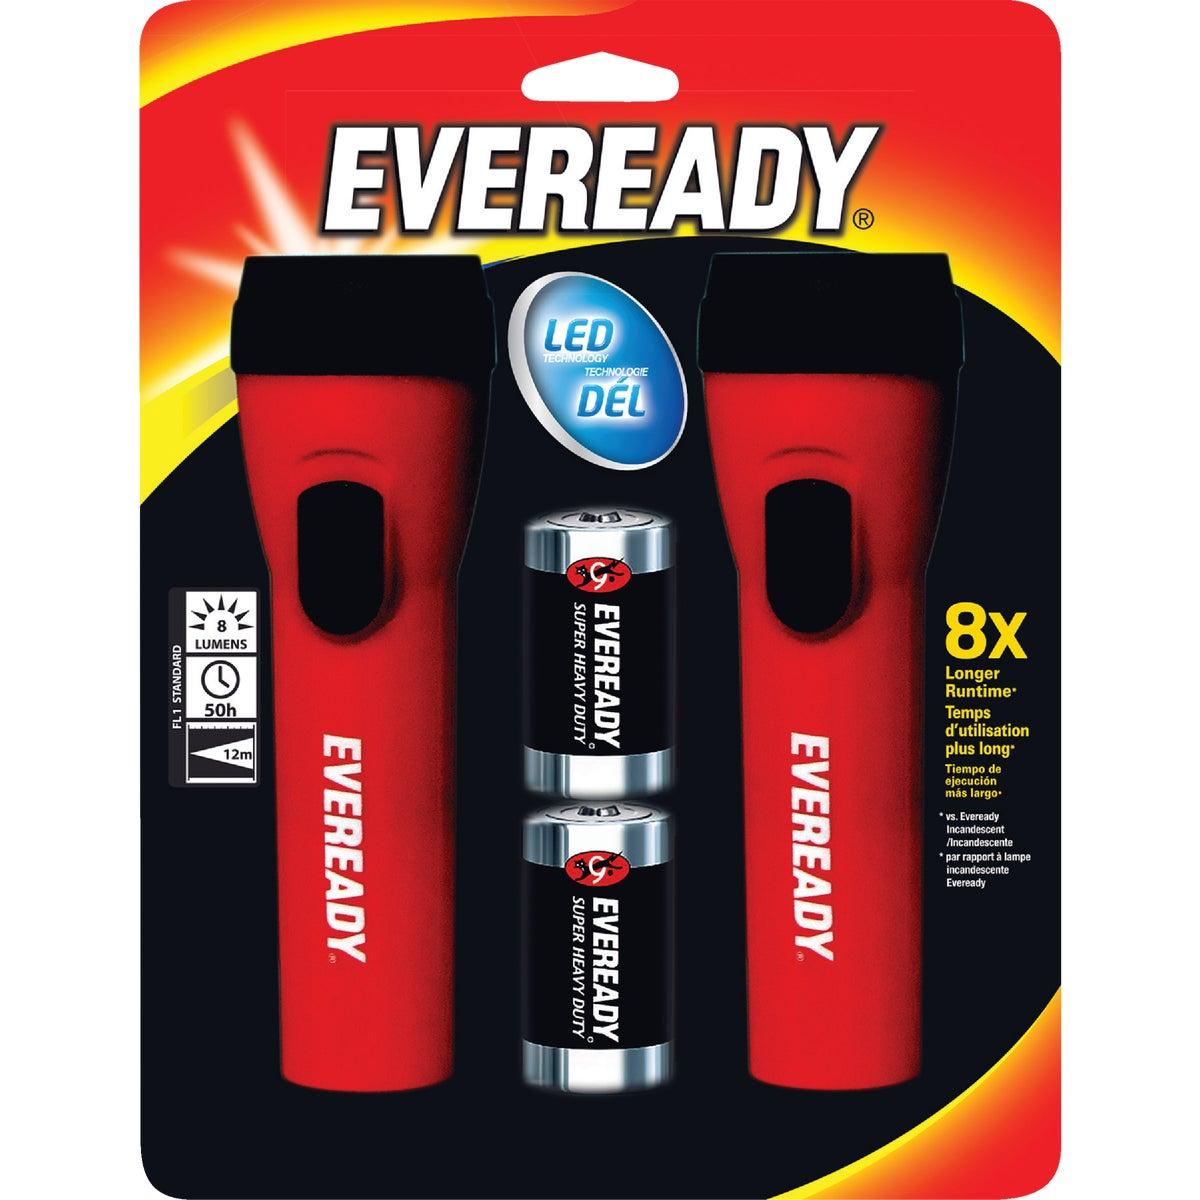 Led W/Battery Flashlight